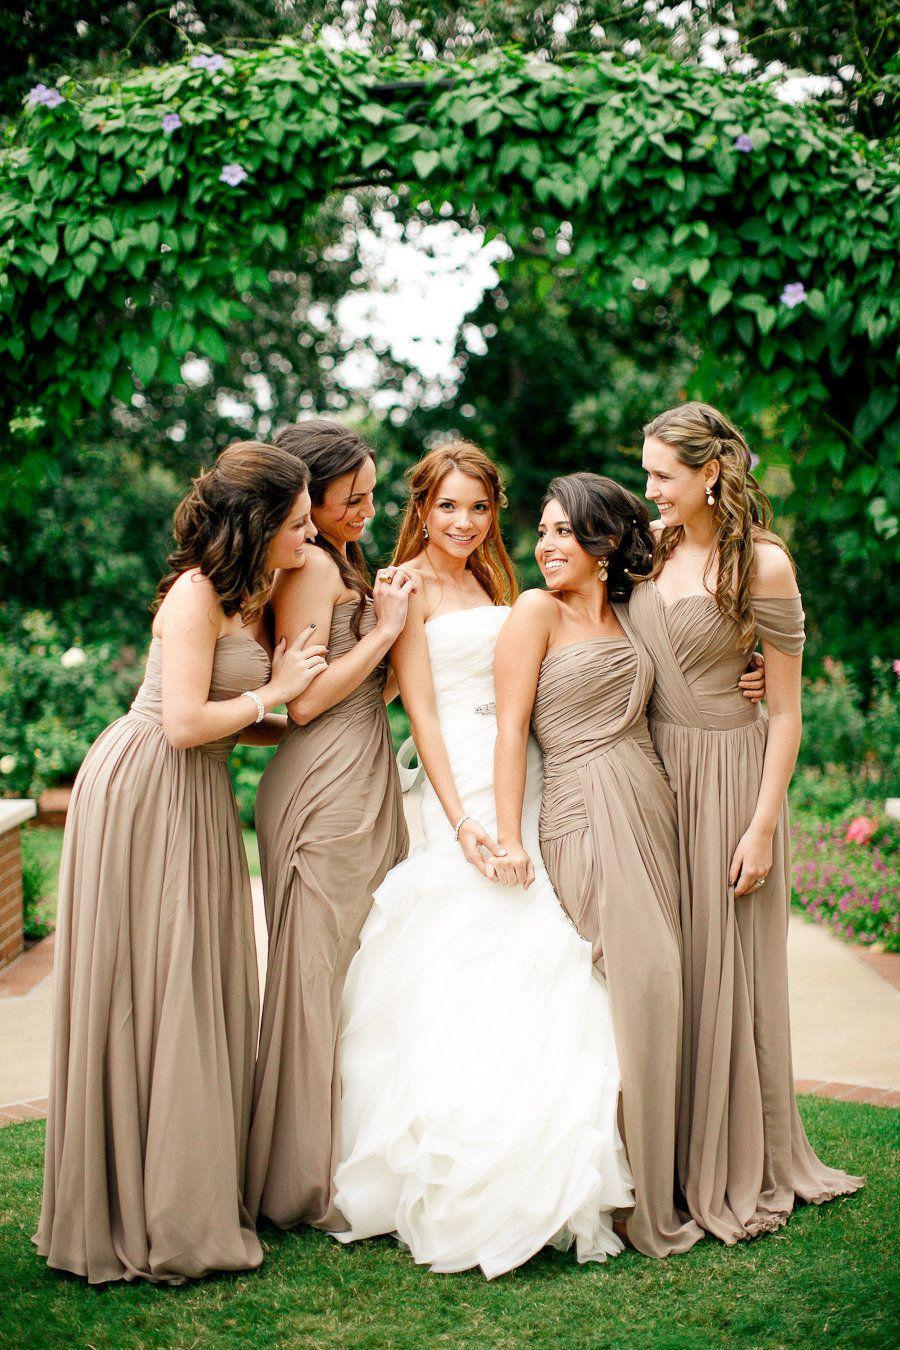 Dallas arboretum wedding from apryl ann photography dallas ann long bridesmaid dresses dallas arboretum wedding from apryl ann photography ombrellifo Image collections